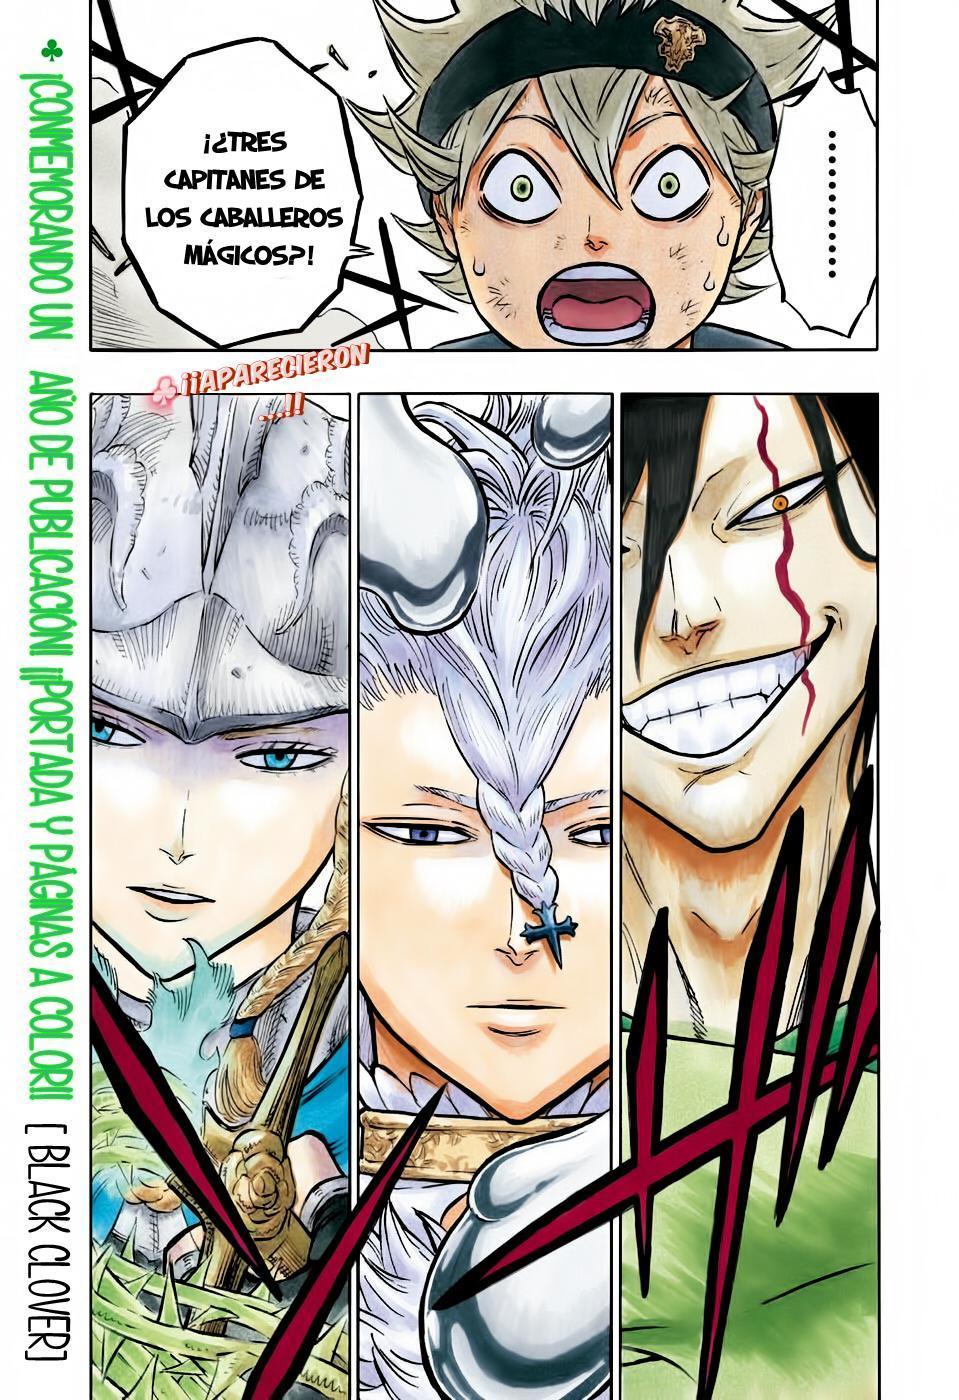 http://c5.ninemanga.com/es_manga/35/3811/449527/2daf9eb6a6cc4da5b32440b6e6976c73.jpg Page 3